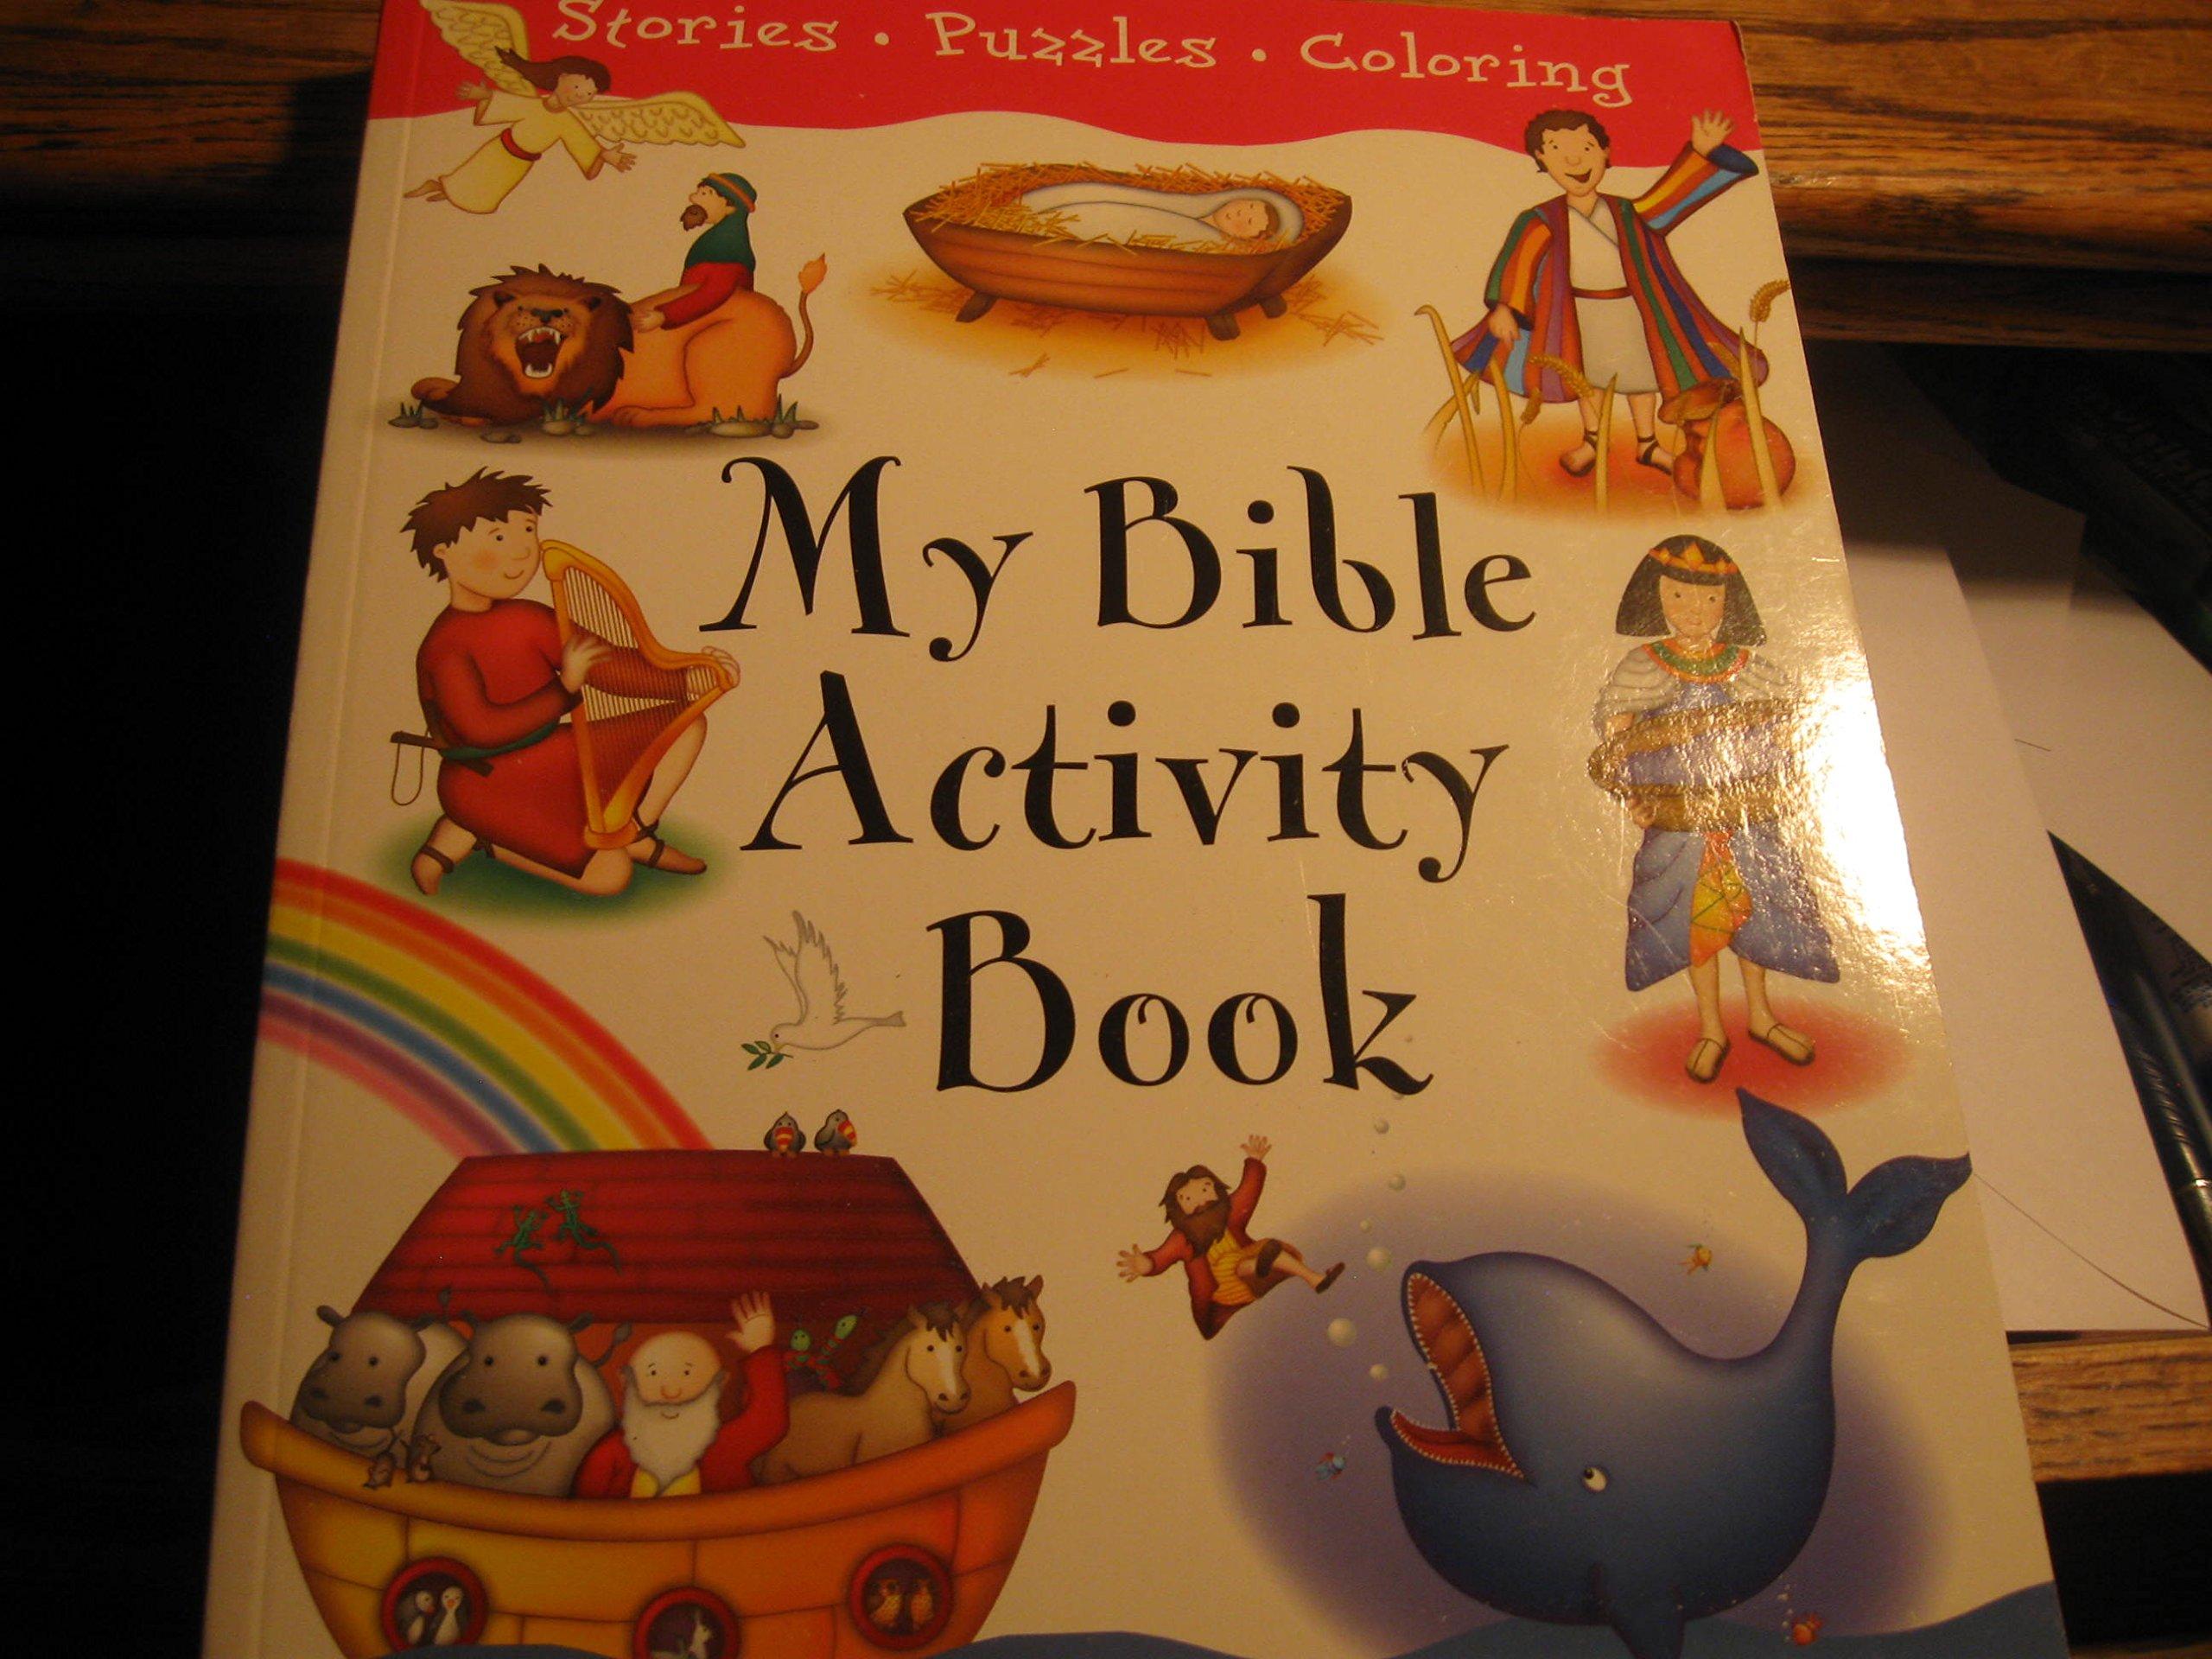 My Bible Activity Book pdf